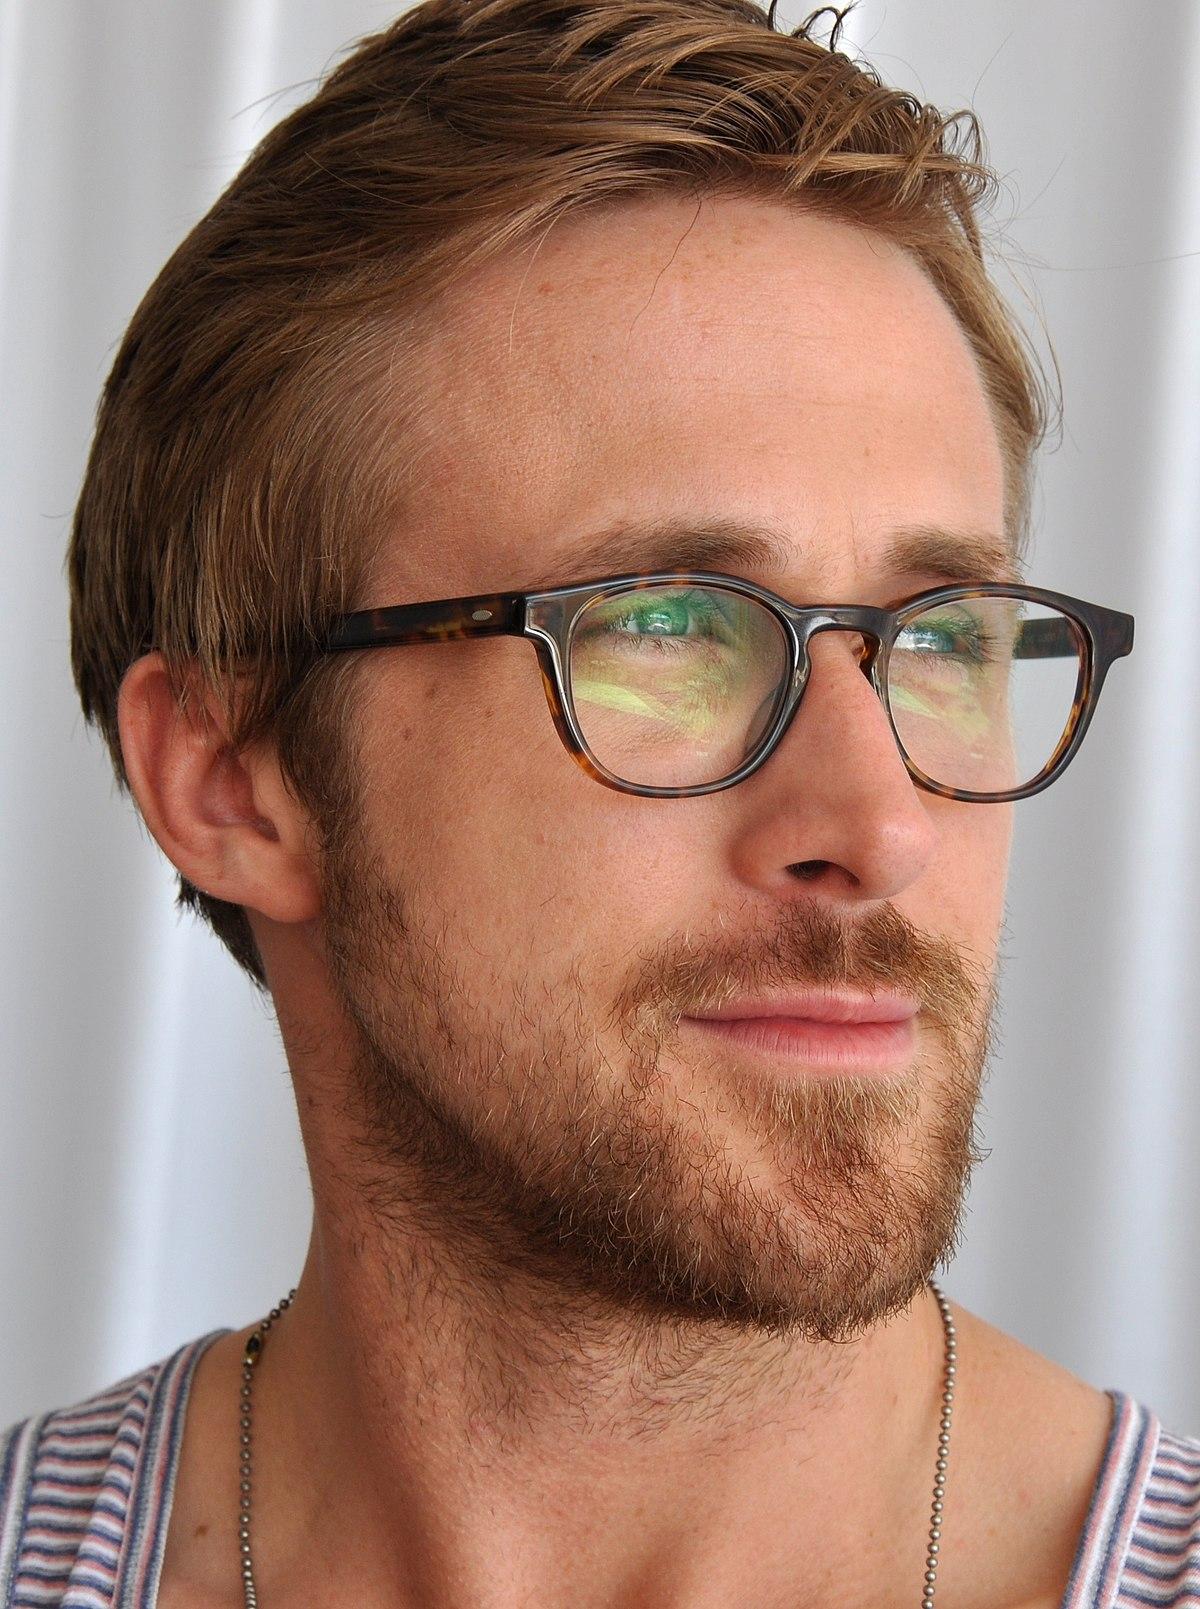 Ryan Gosling - Wikiped...